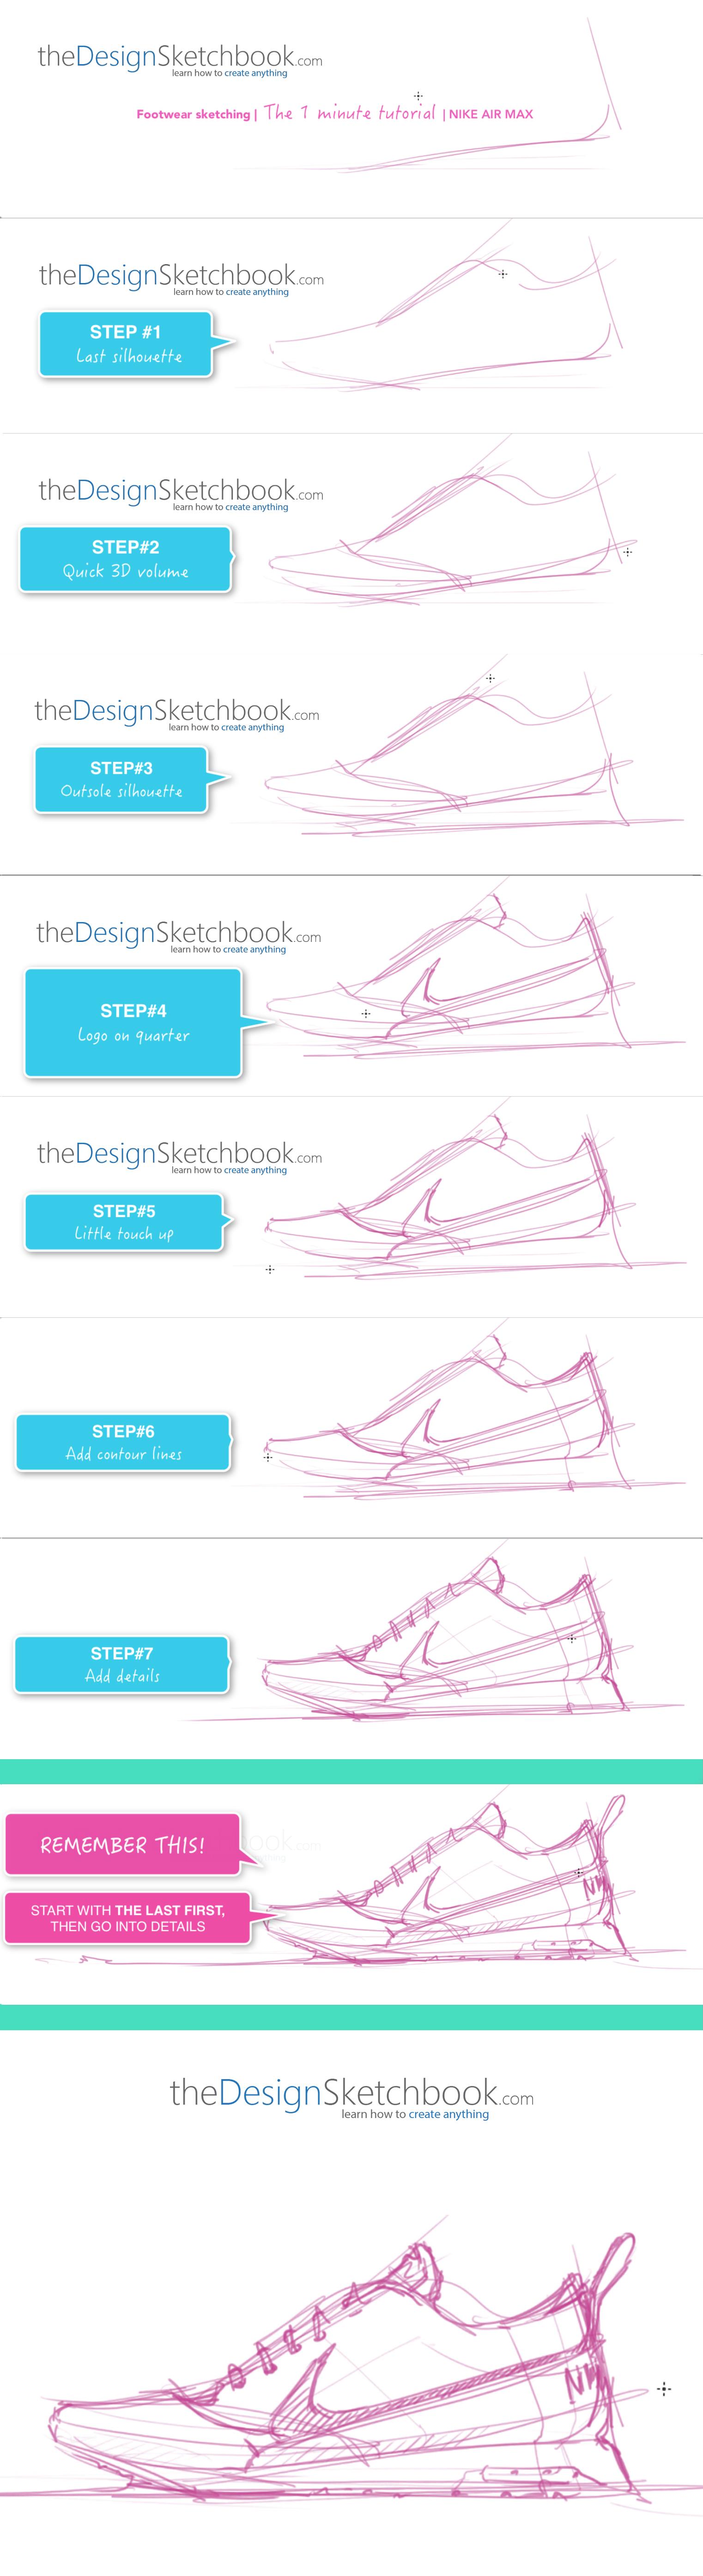 Nike Air Max Design sketching - The design sketchbook - the 1 minute tutorial